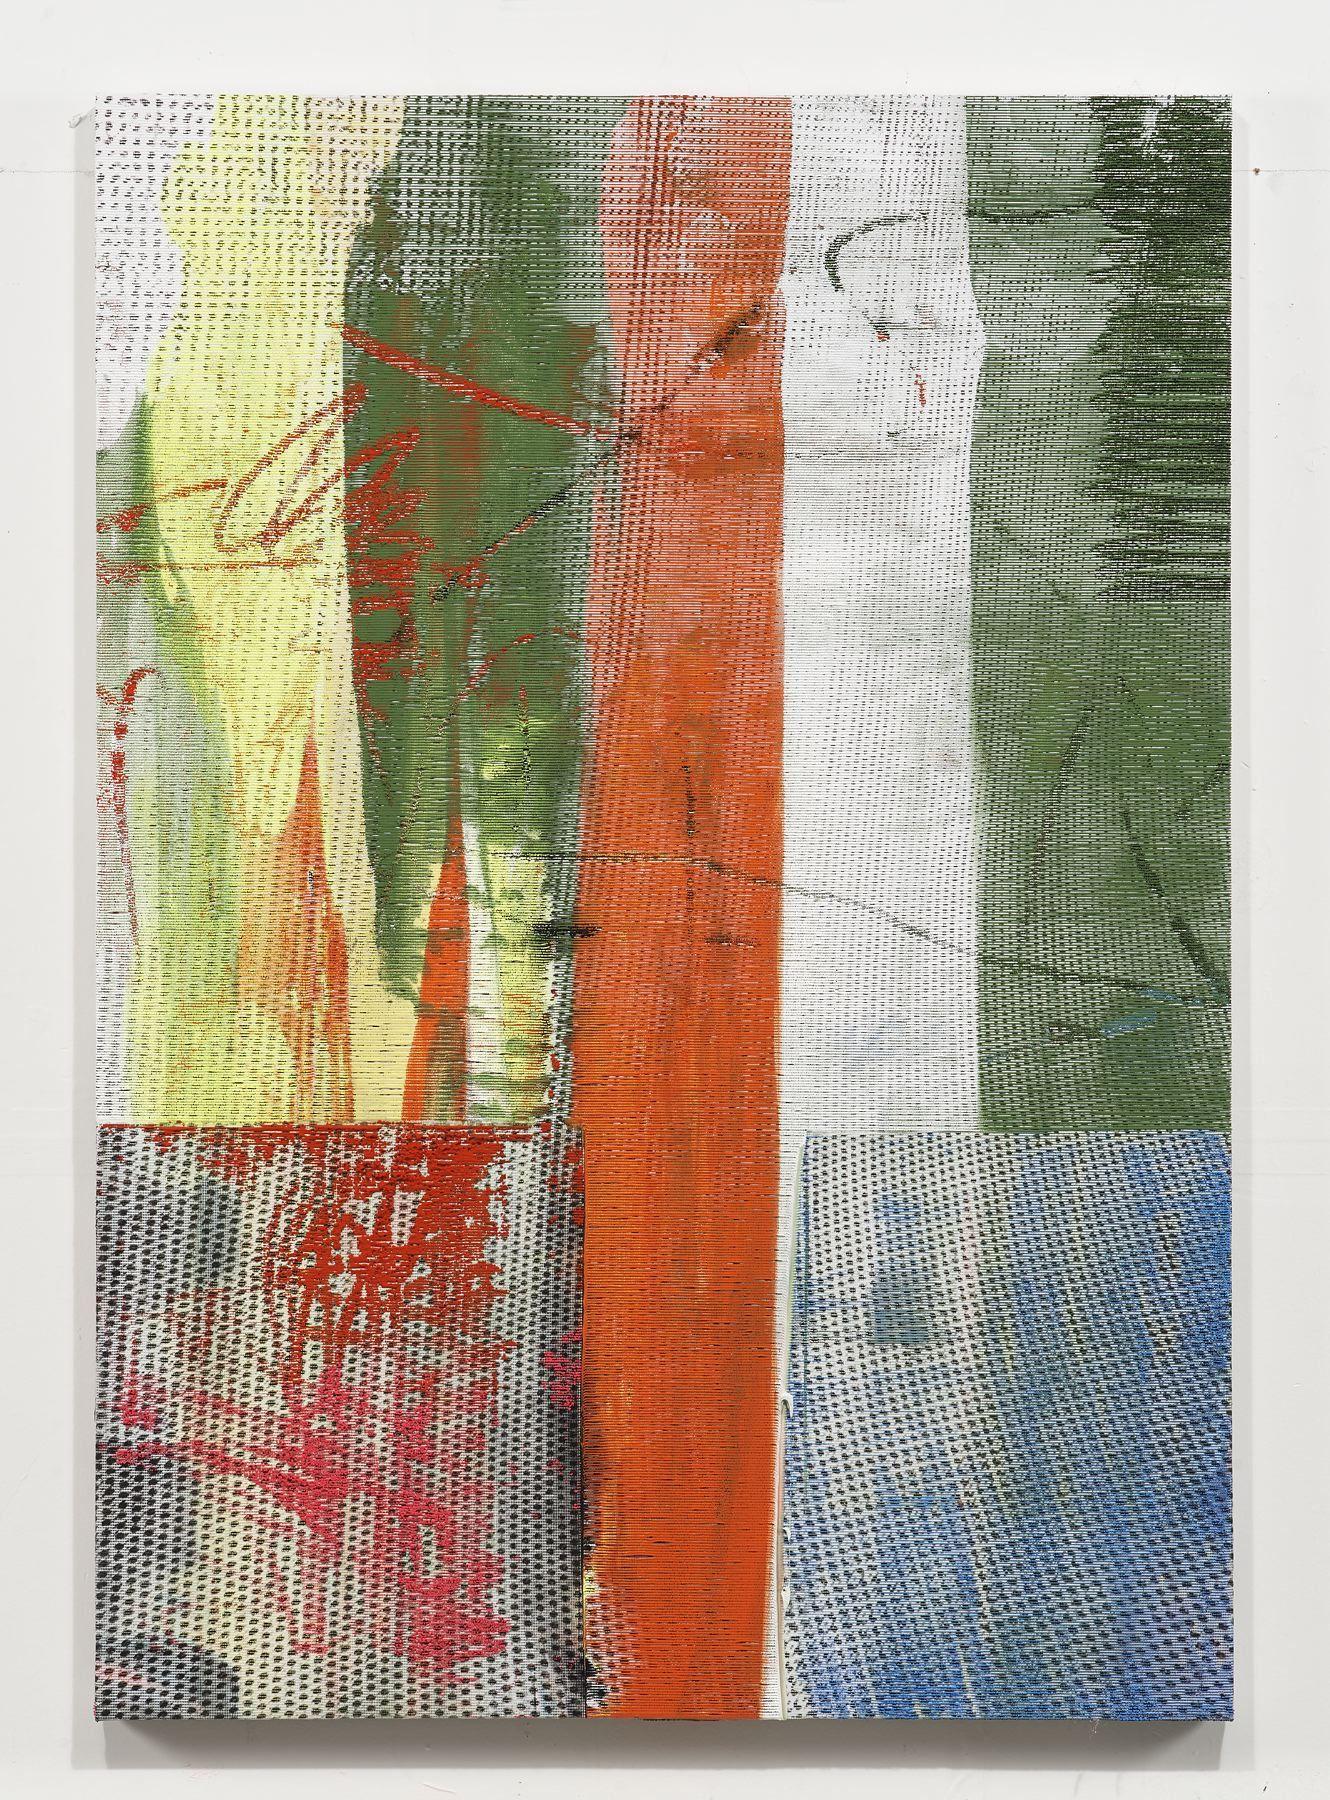 Evan Nesbit Manifold Painting (Fake Painting No.1),2017